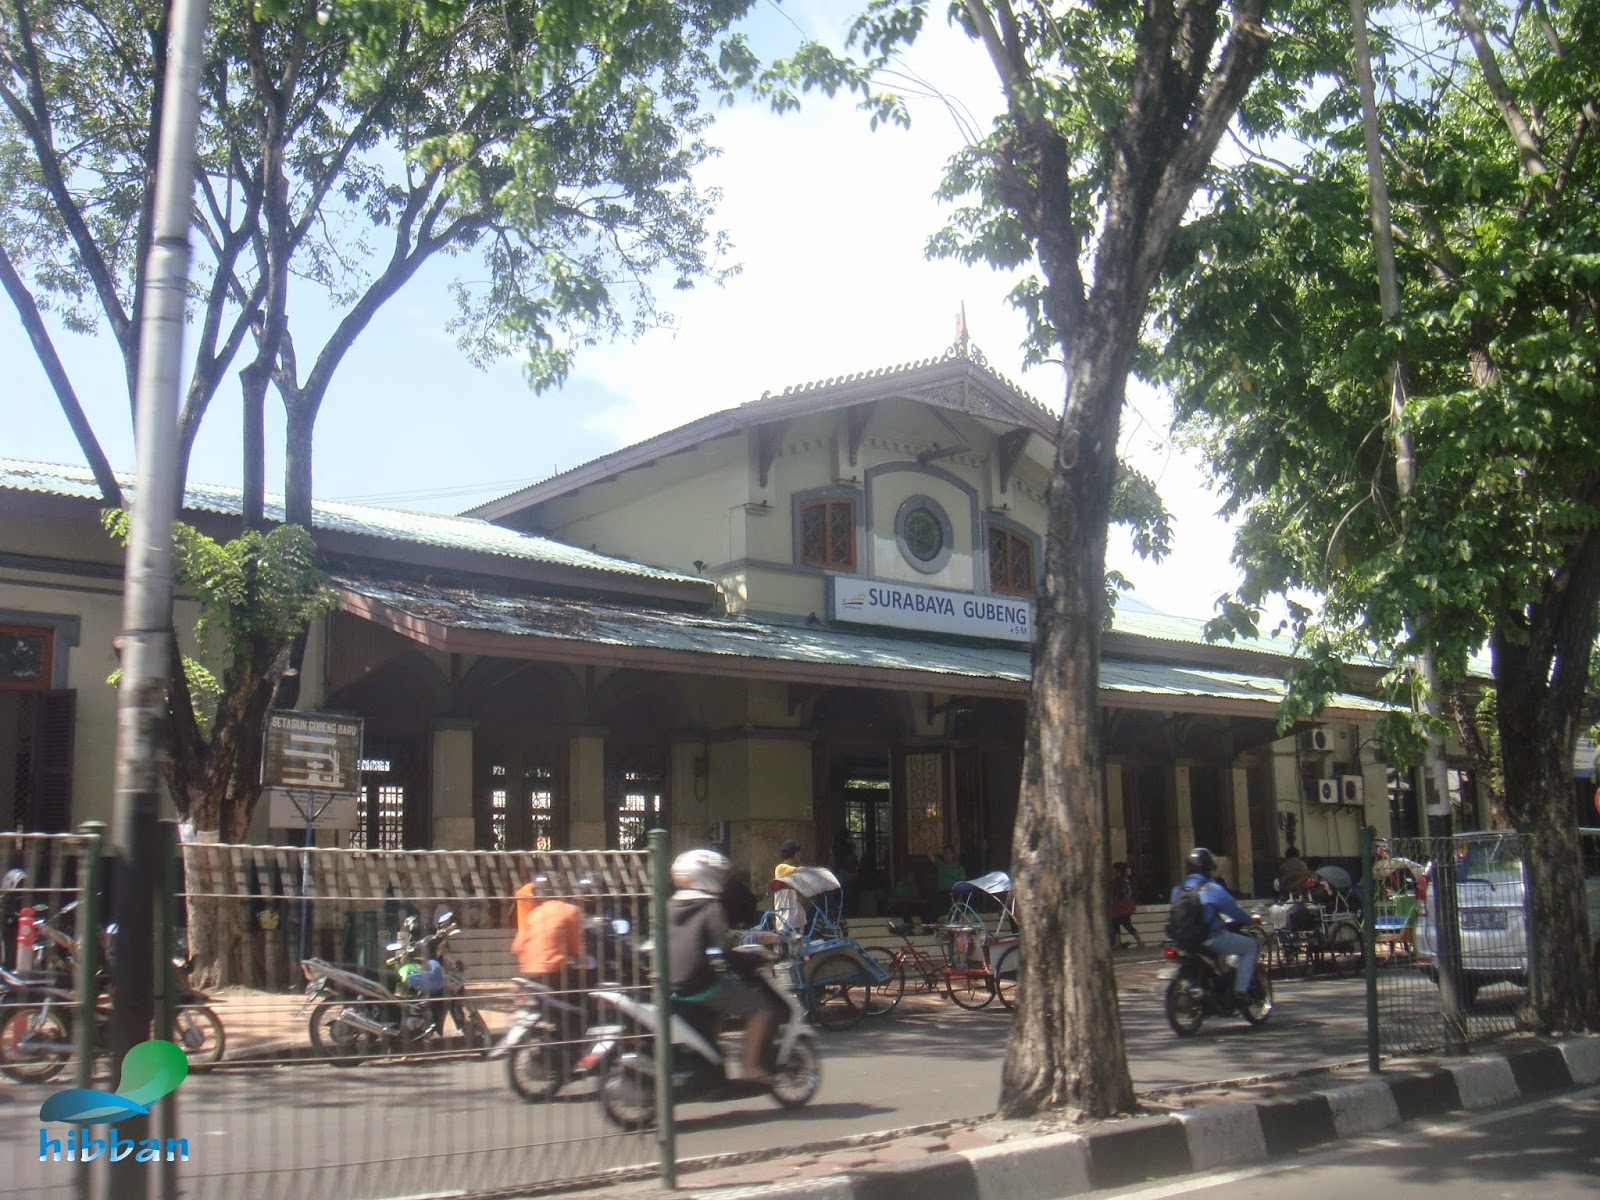 info.okeygan: Stasiun Gubeng Lama Surabaya Jawa Timur.